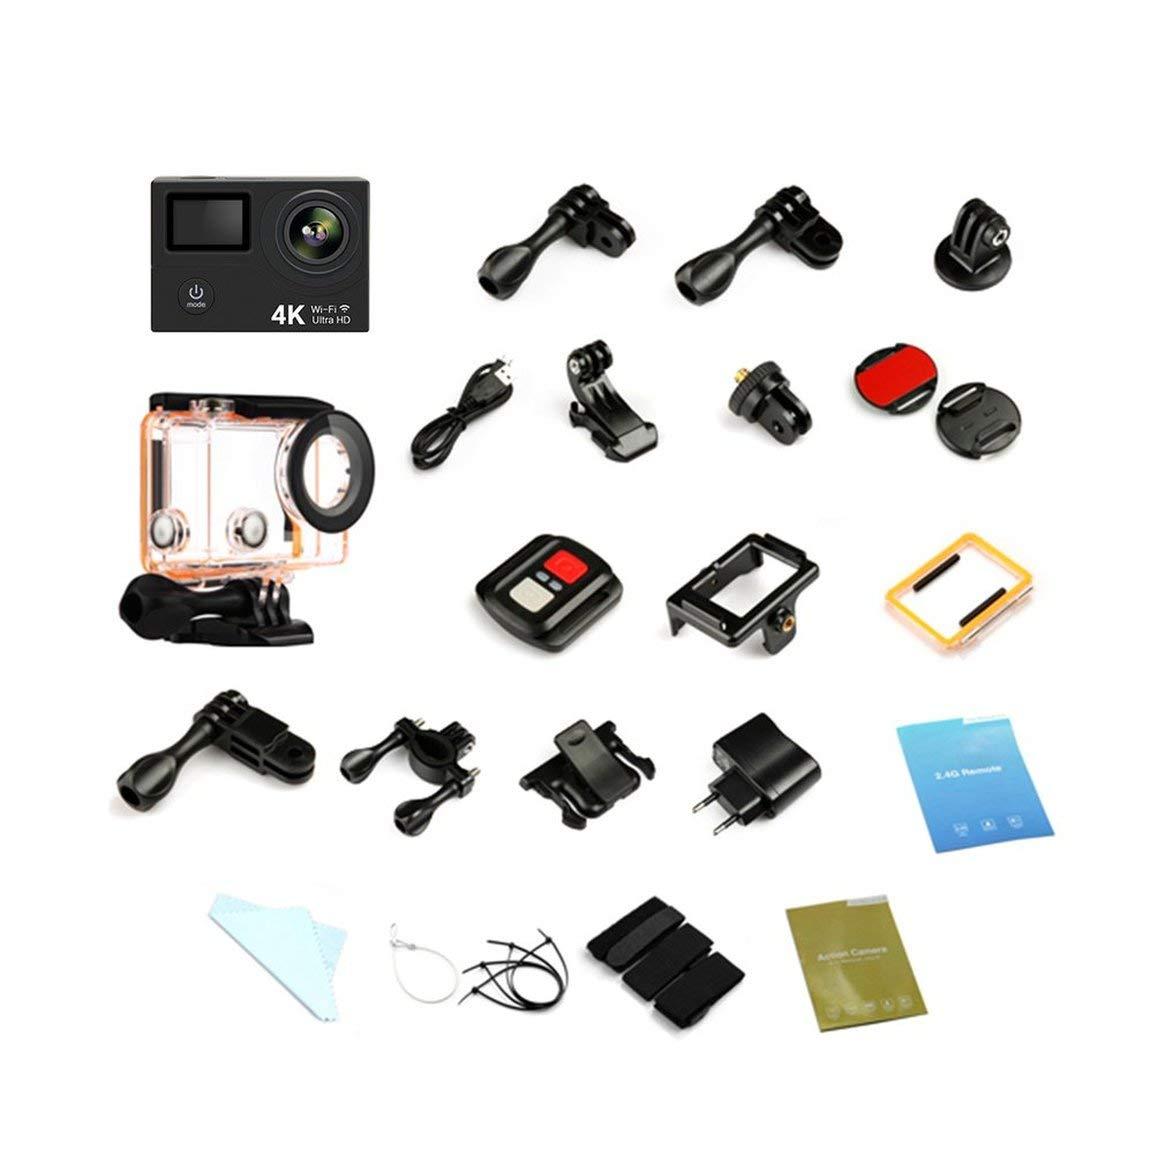 Delicacydex Mini H3R 4K Ultra Full HD Sport Kamera WiFi Fernbedienung Unterwasser Bewegung Digitale Wasserdichte Videokamera